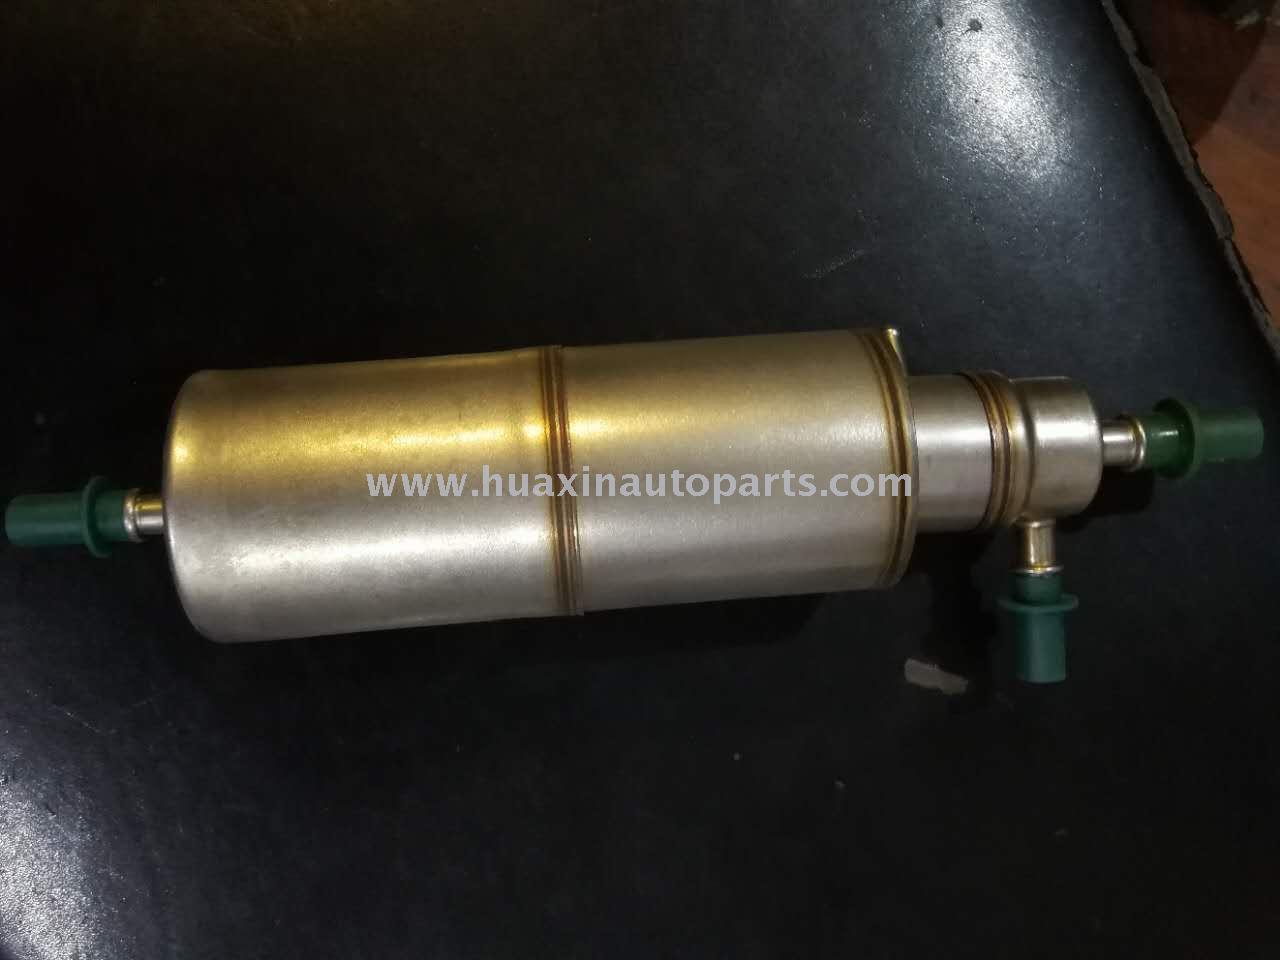 Supply Mercedes Benz Fuel Filter 1634770701 01 Ml320 Location Woodward Stop Solenoid 1504 24c2u1b1s1